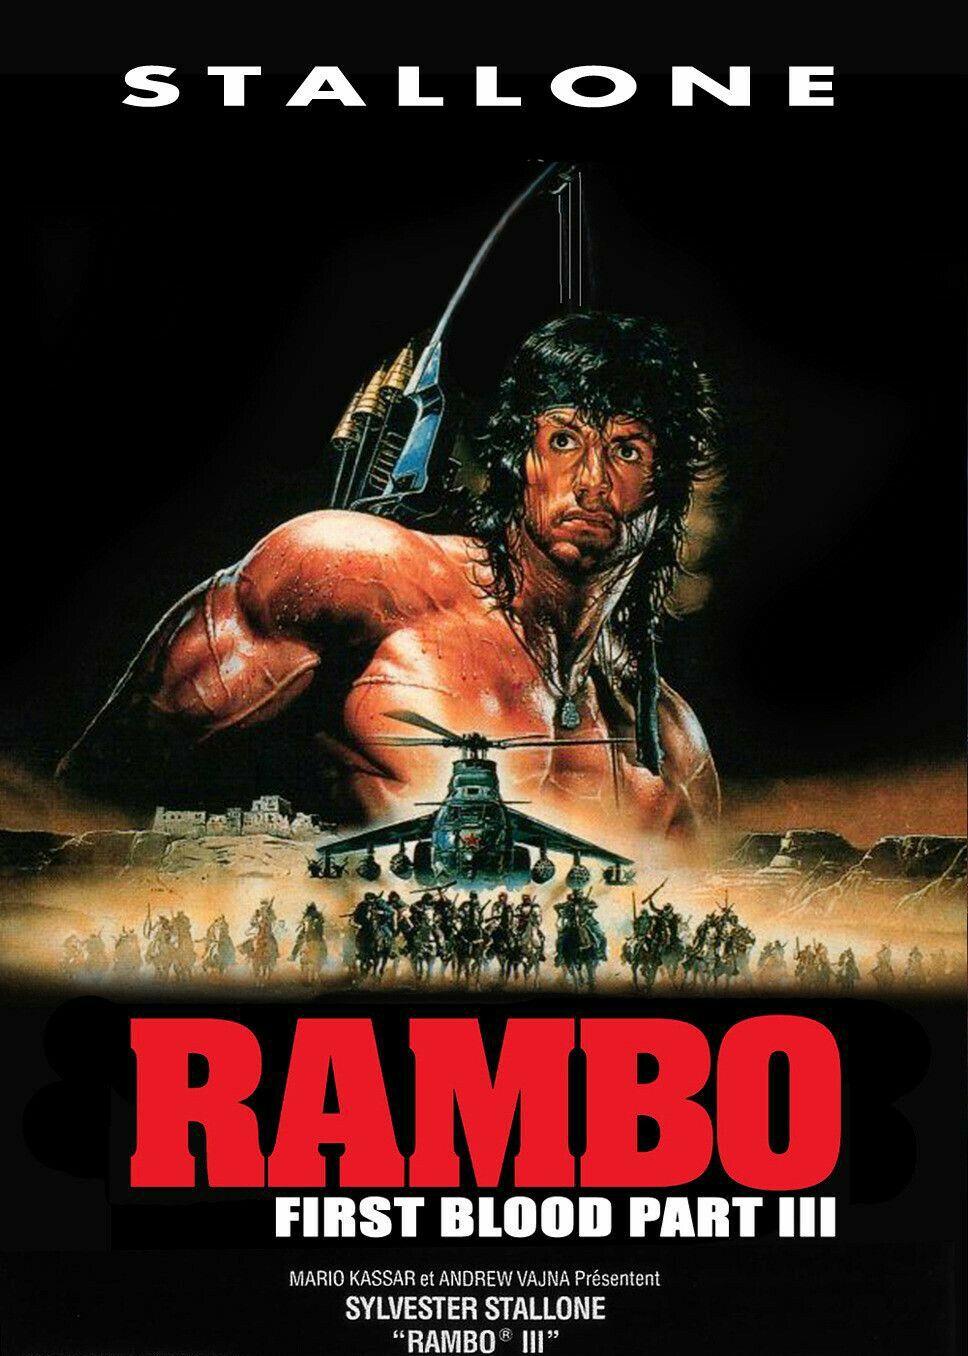 Rambo 3 1988 Sylvester Stallone Goruntuler Ile Poster